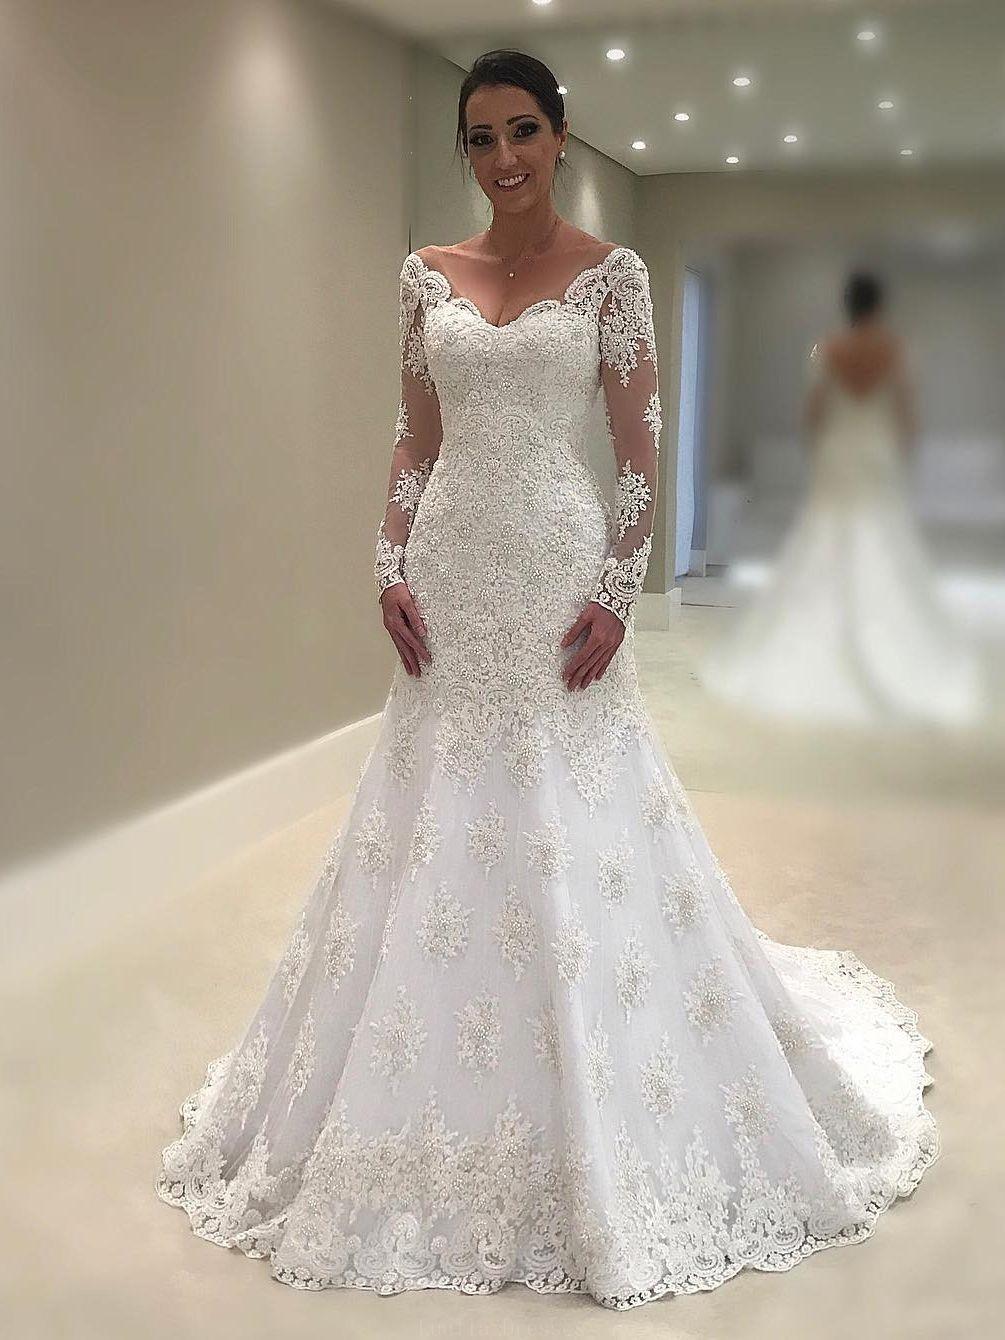 2018 Wedding Dresses Wedding Dresses Lace Wedding Dresses 2018